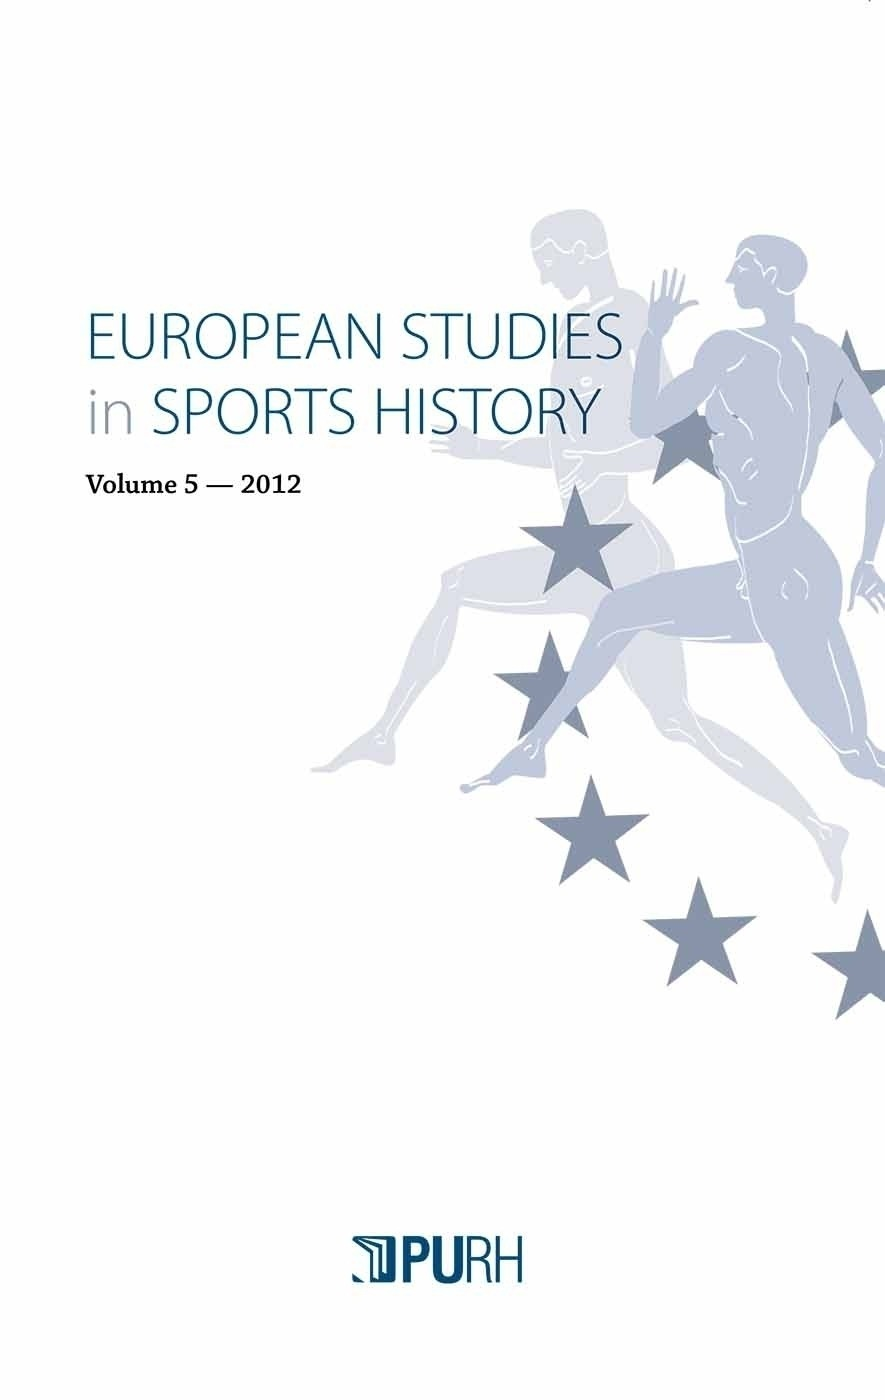 European studies in sports history 2012